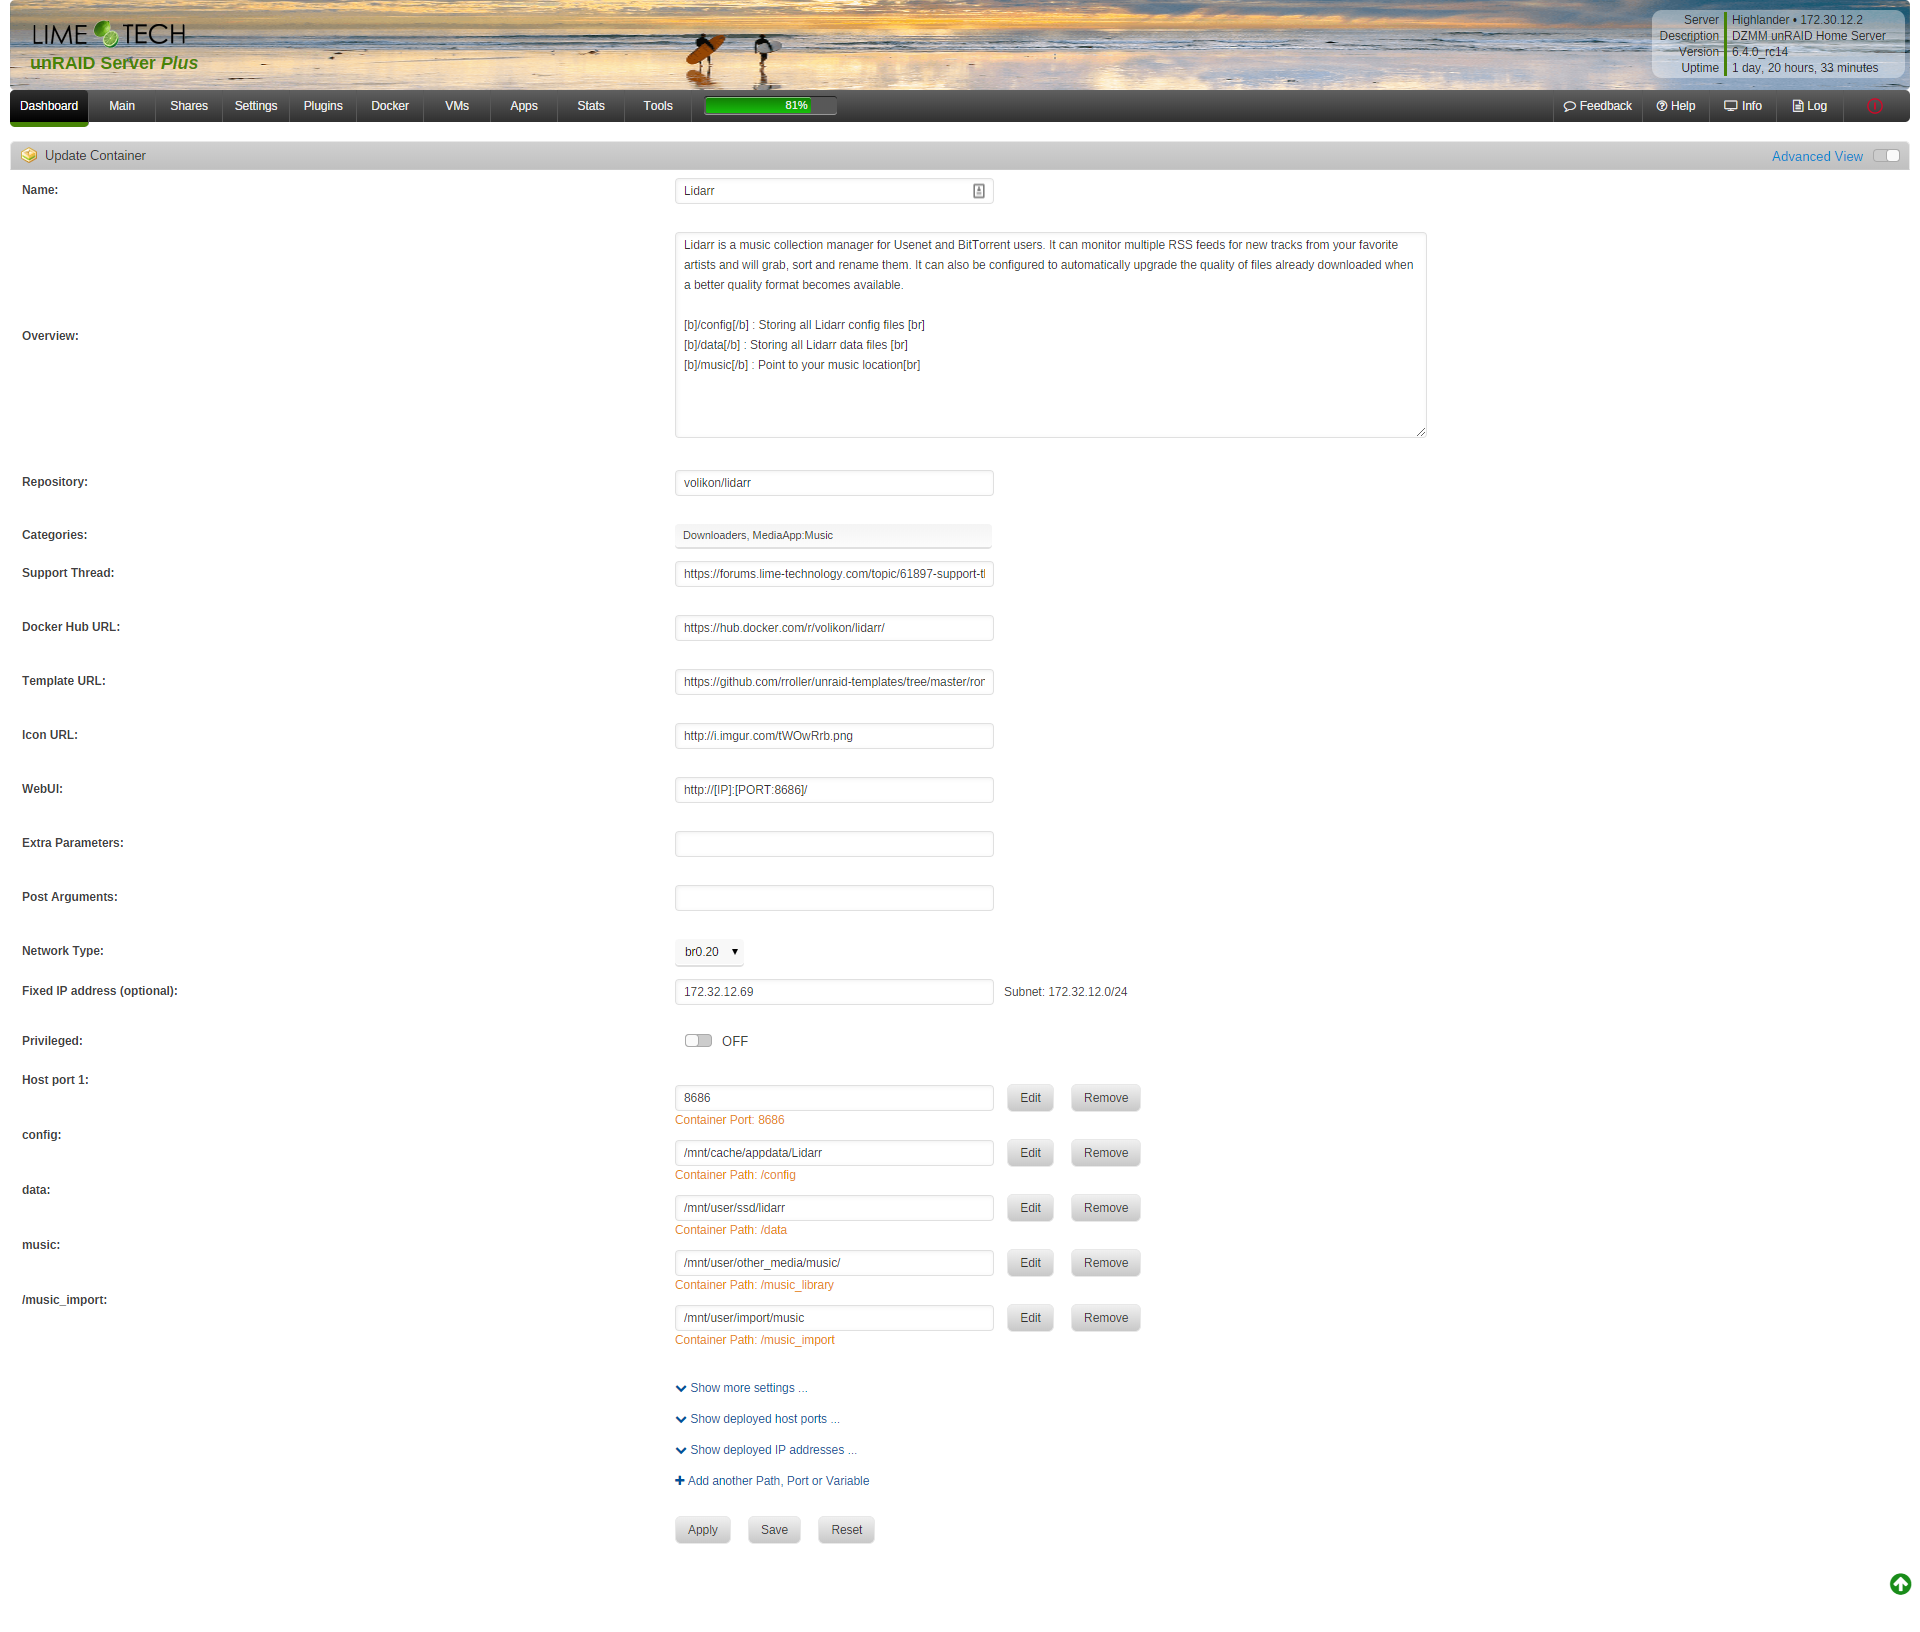 Docker: doesn't support macvlan - webui not accessible when assign